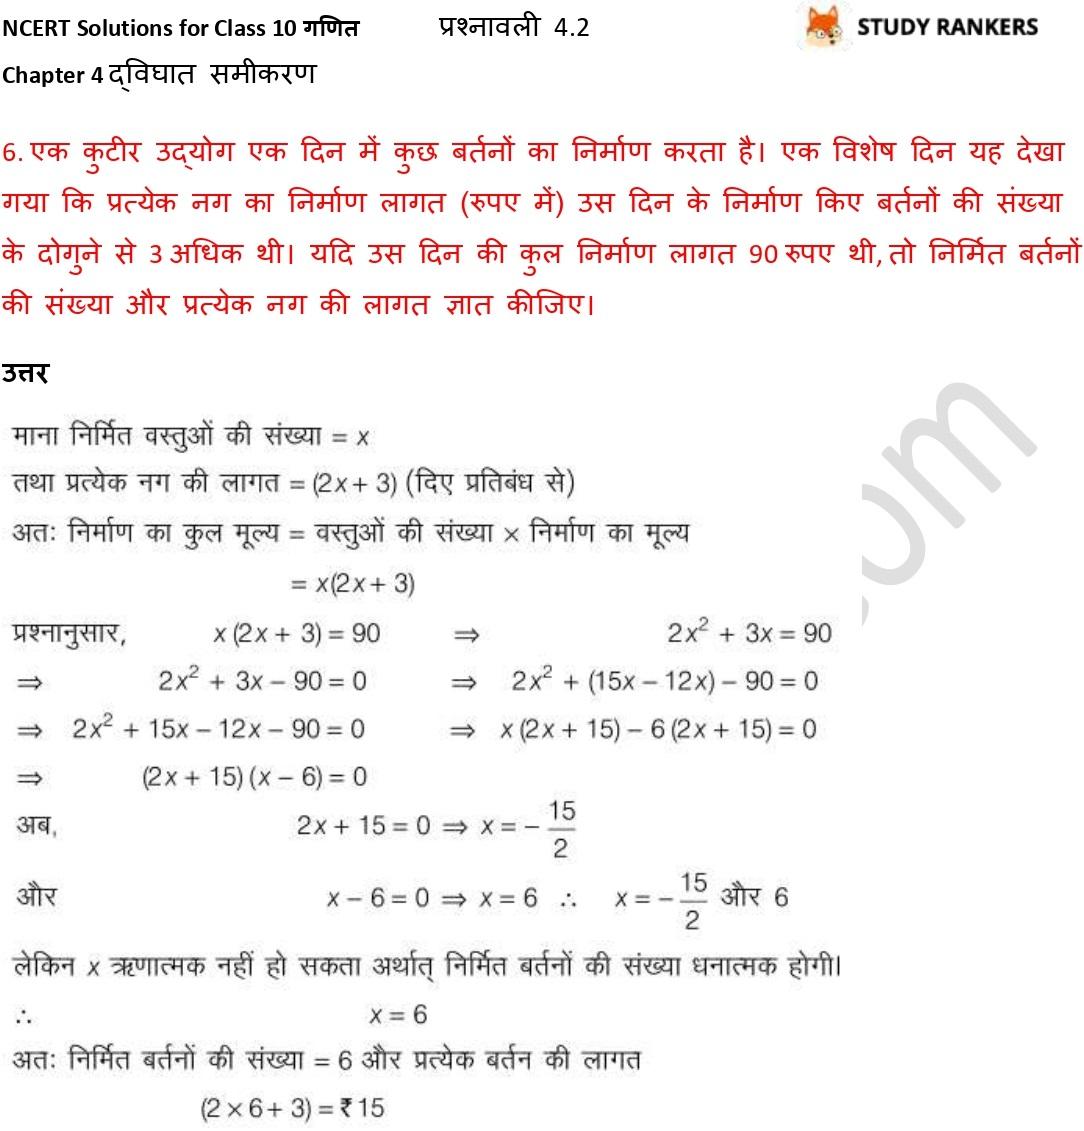 NCERT Solutions for Class 10 Maths Chapter 4 द्विघात समीकरण प्रश्नावली 4.2 Part 7